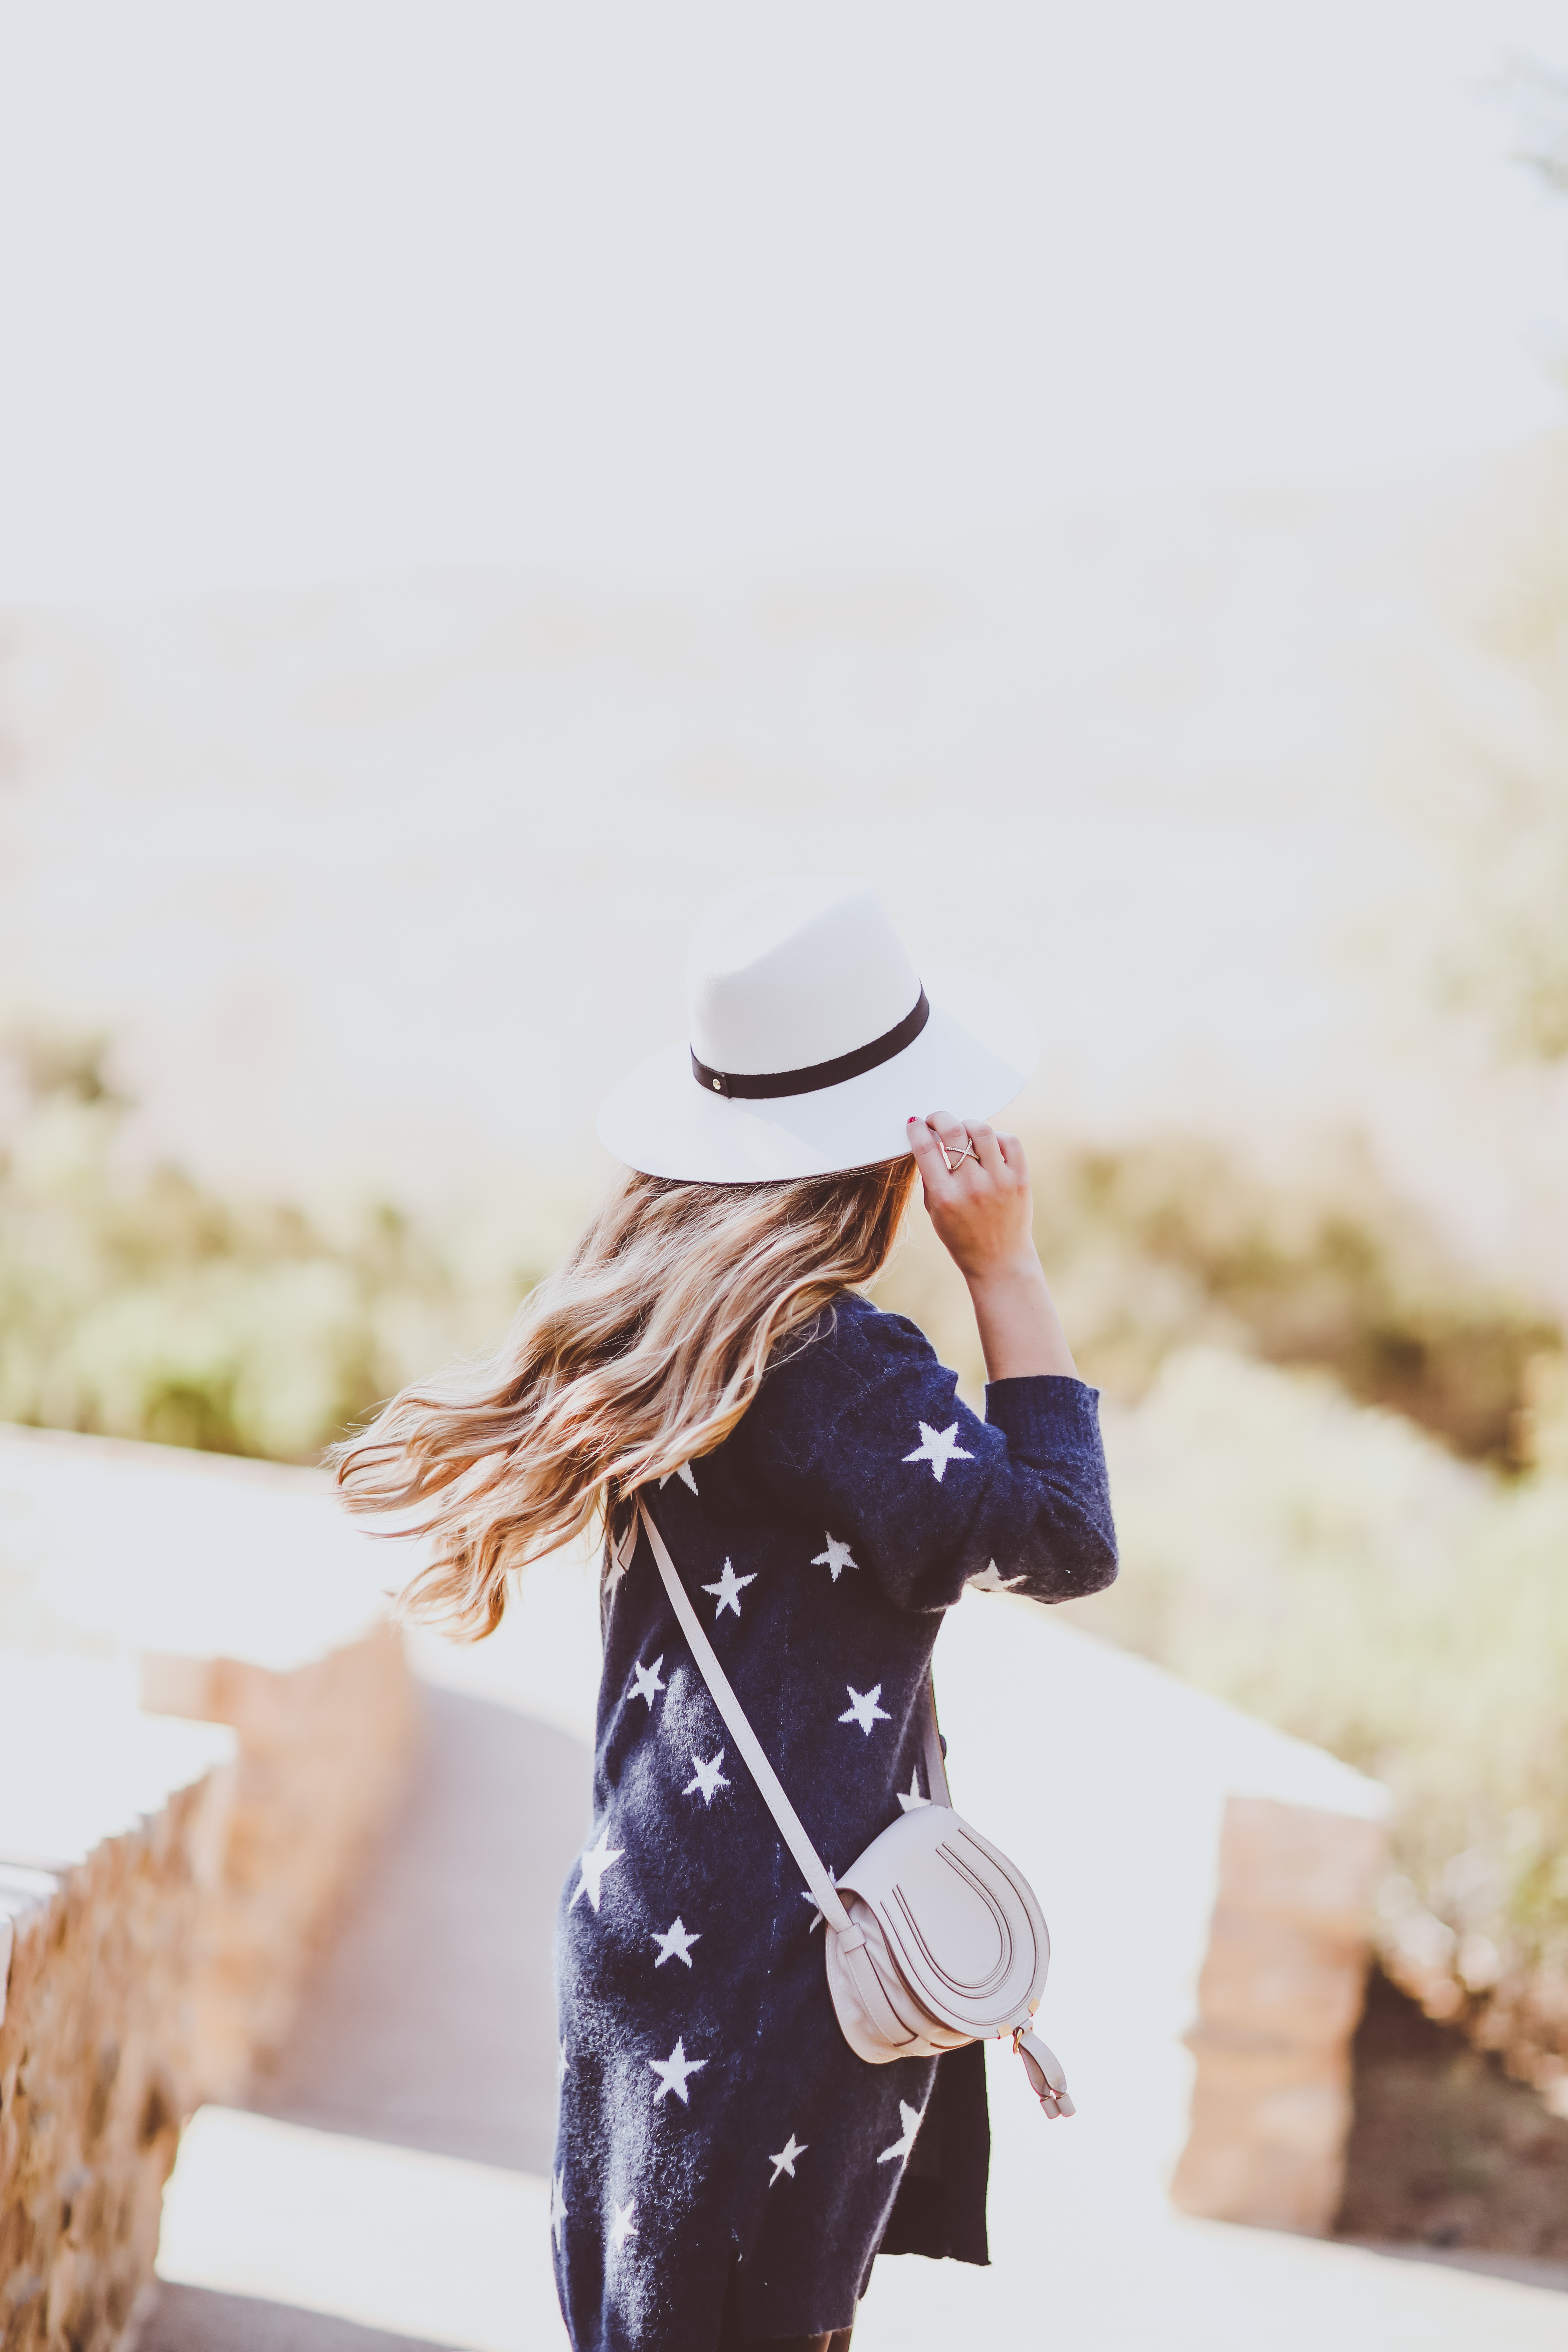 #OOTD // Star Cardigan, Nursing Tee & Leggings   BondGirlGlam.com